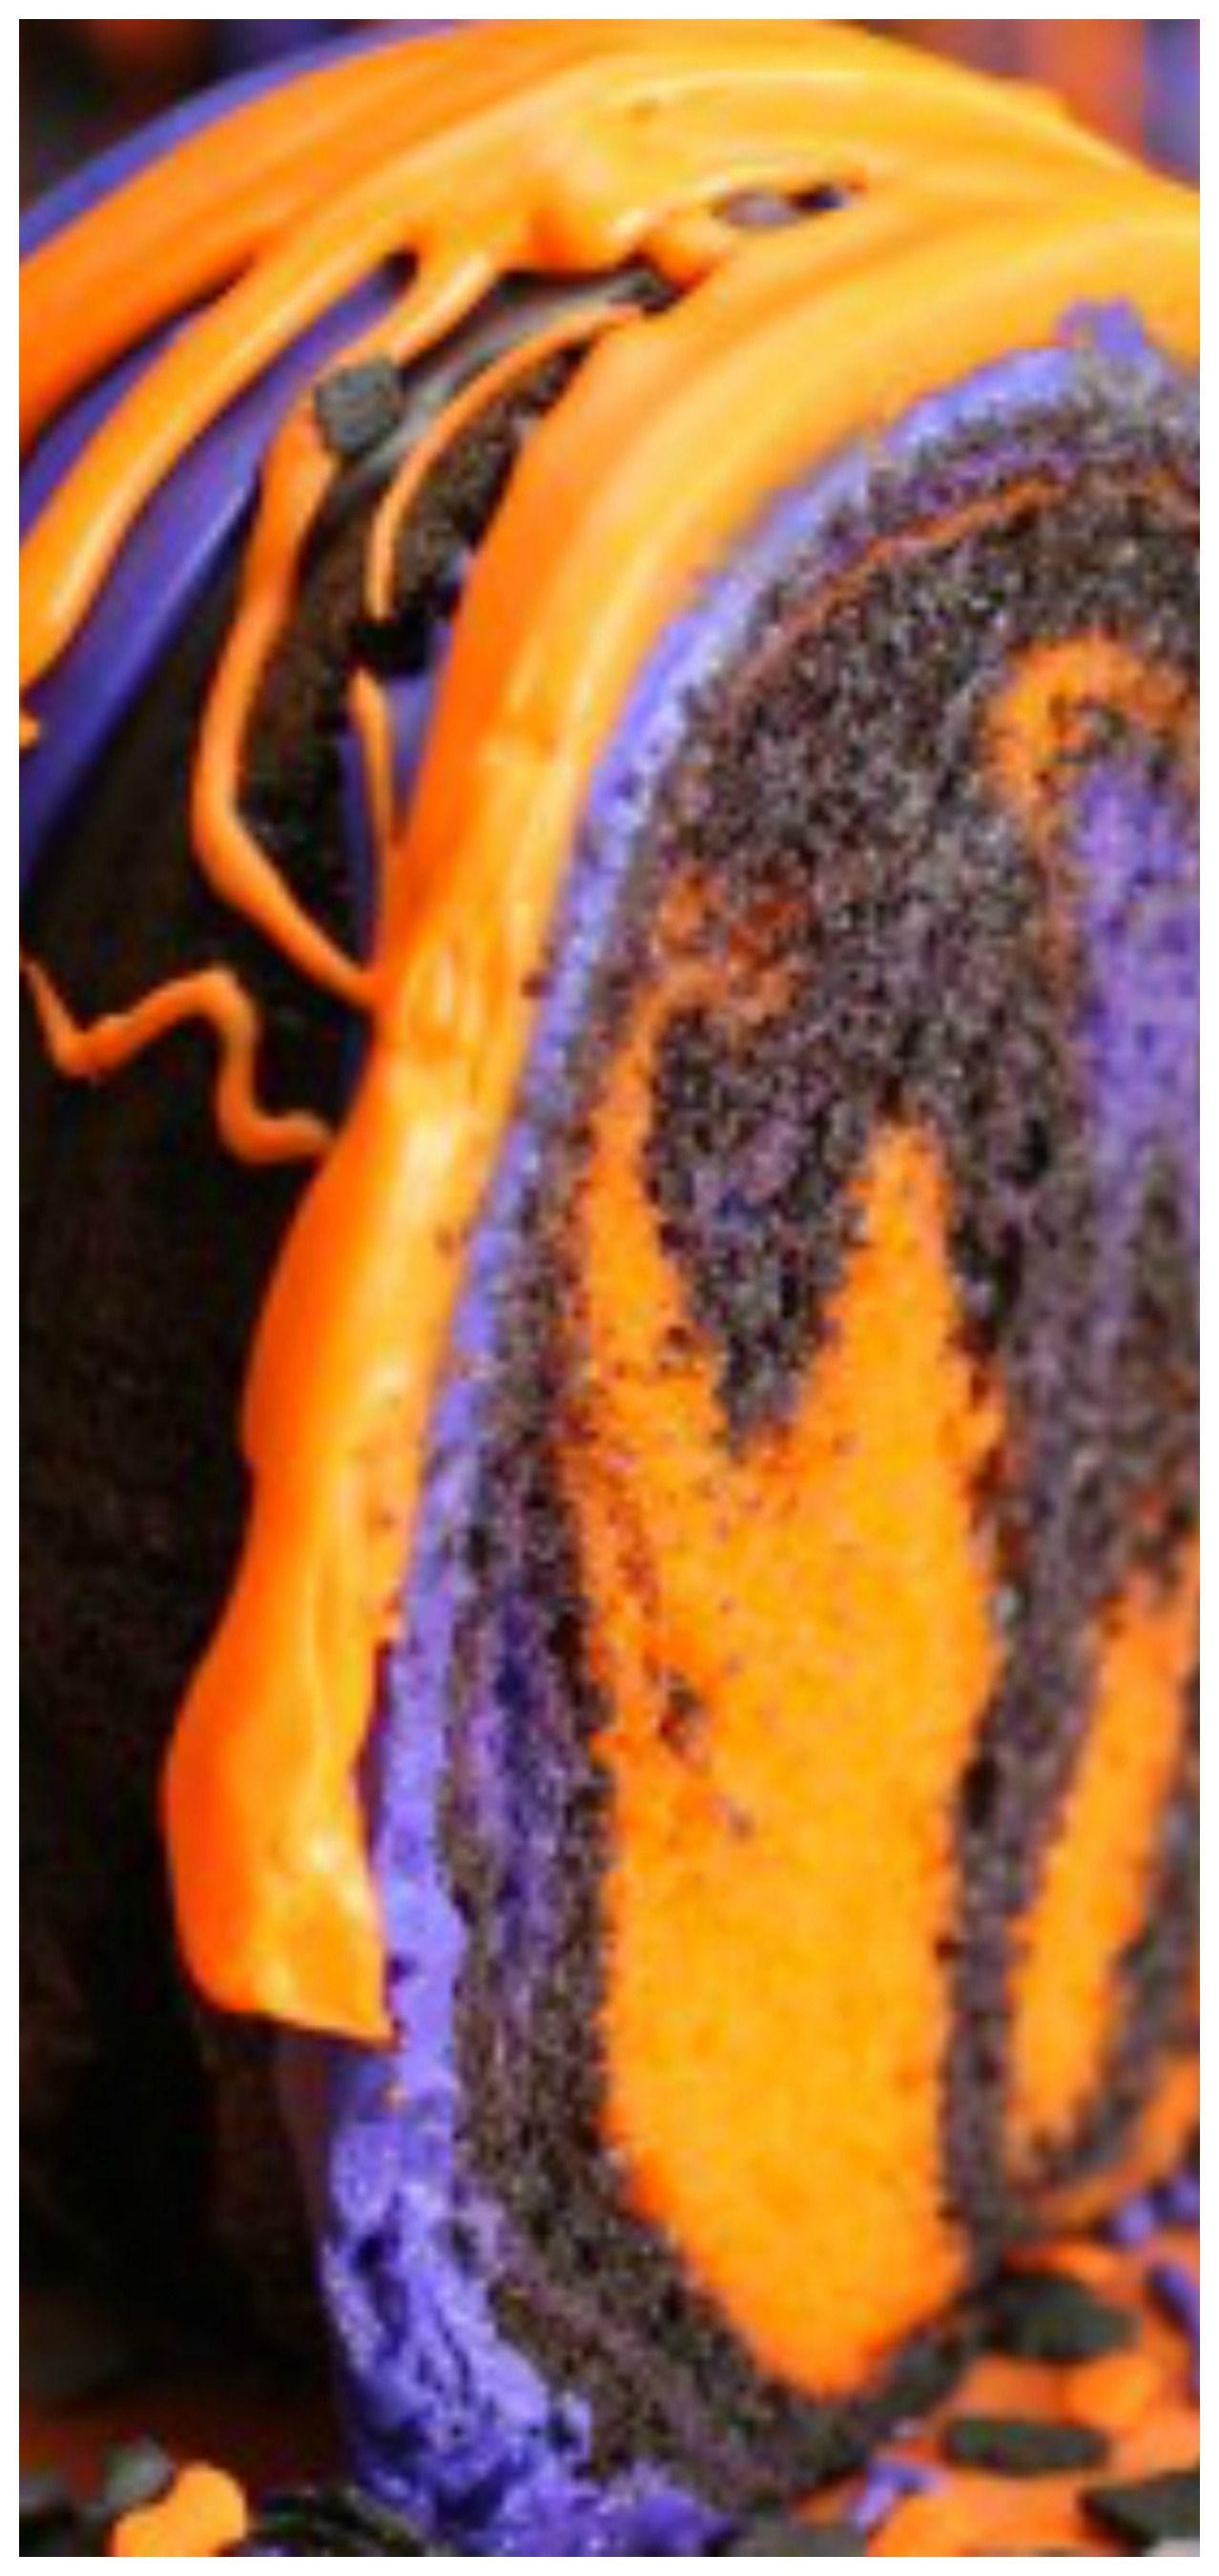 Amazing Halloween Rainbow Party Bundt Cake Easy And Simple To Make Orange Purple Black And Chocolate All Bundt Cakes Recipes Easy Bundt Cake Bundt Cake